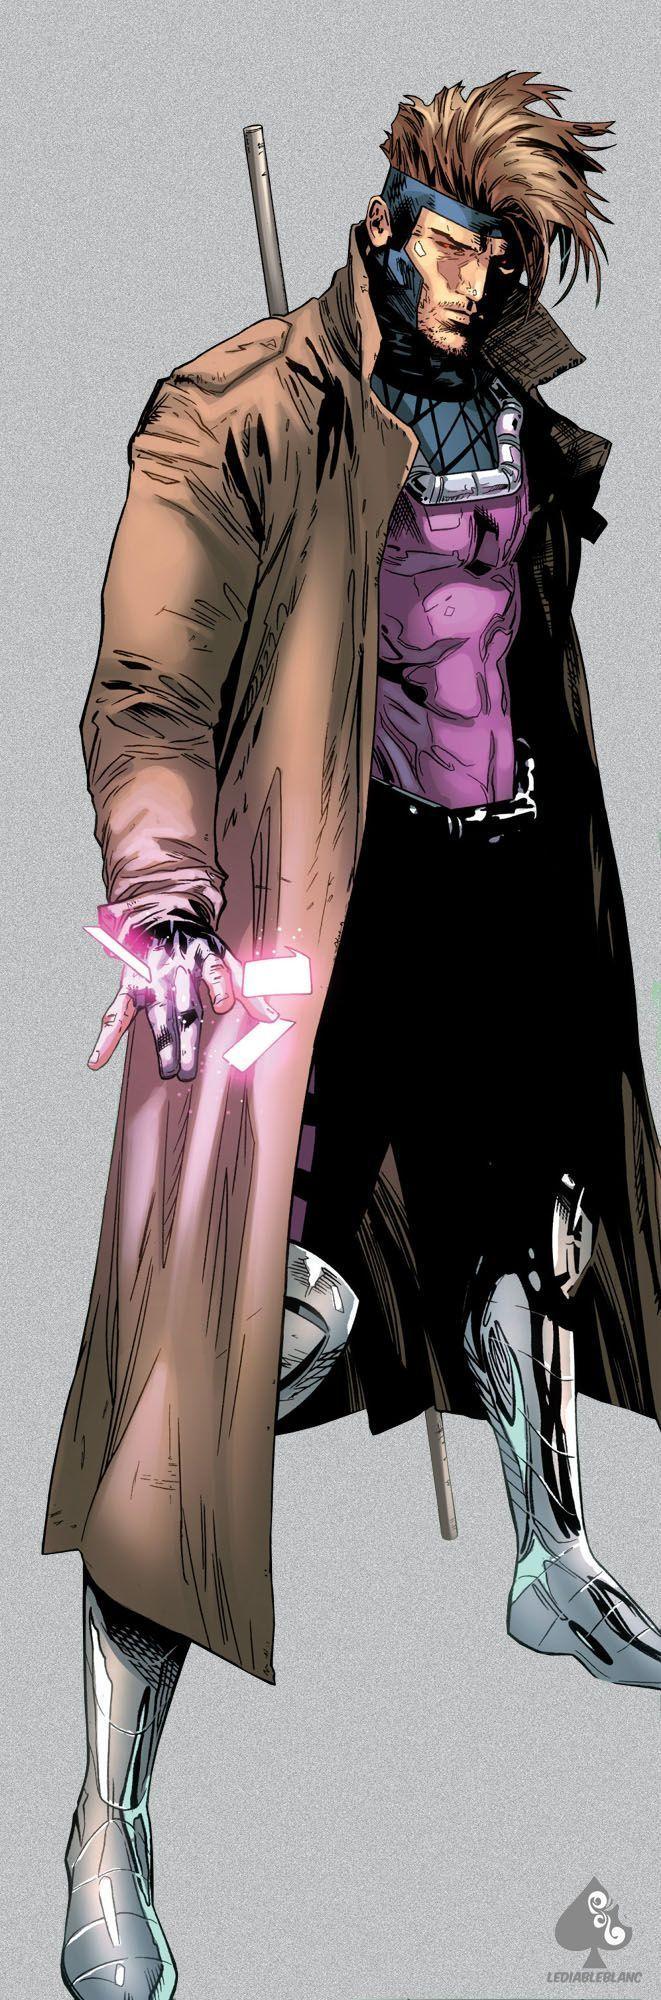 Shop Most Popular USA Marvel X-Men Nightcrawler Global Shipping Eligible Item On Amazon. com By Clicking Image!